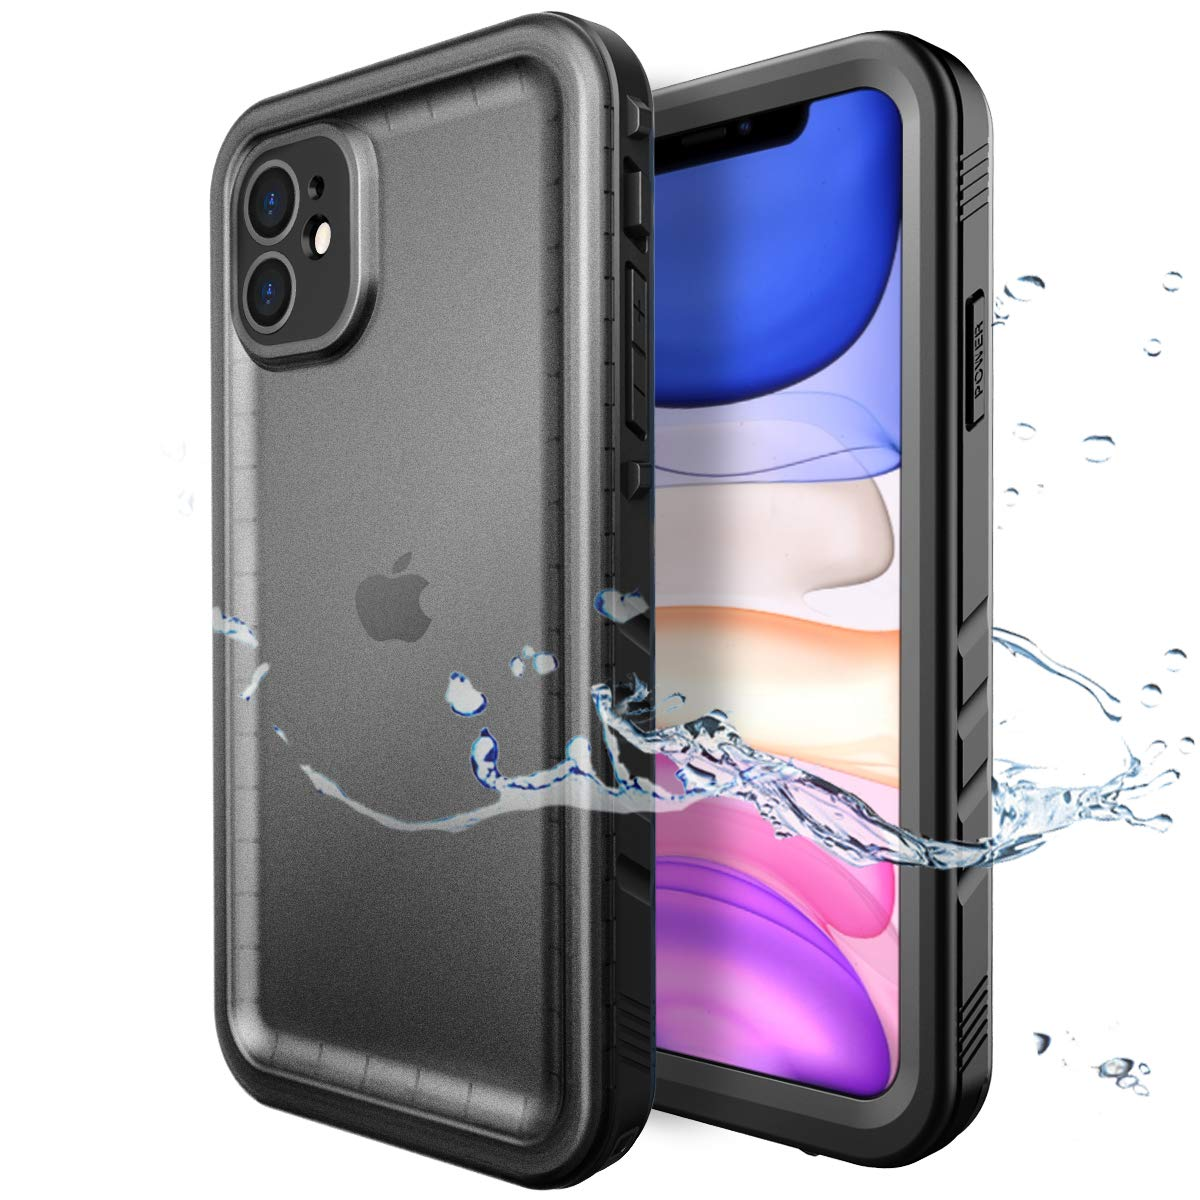 Funda Sumergible Para iPhone 11 (6.1) Sportlink [7x8trh6x]